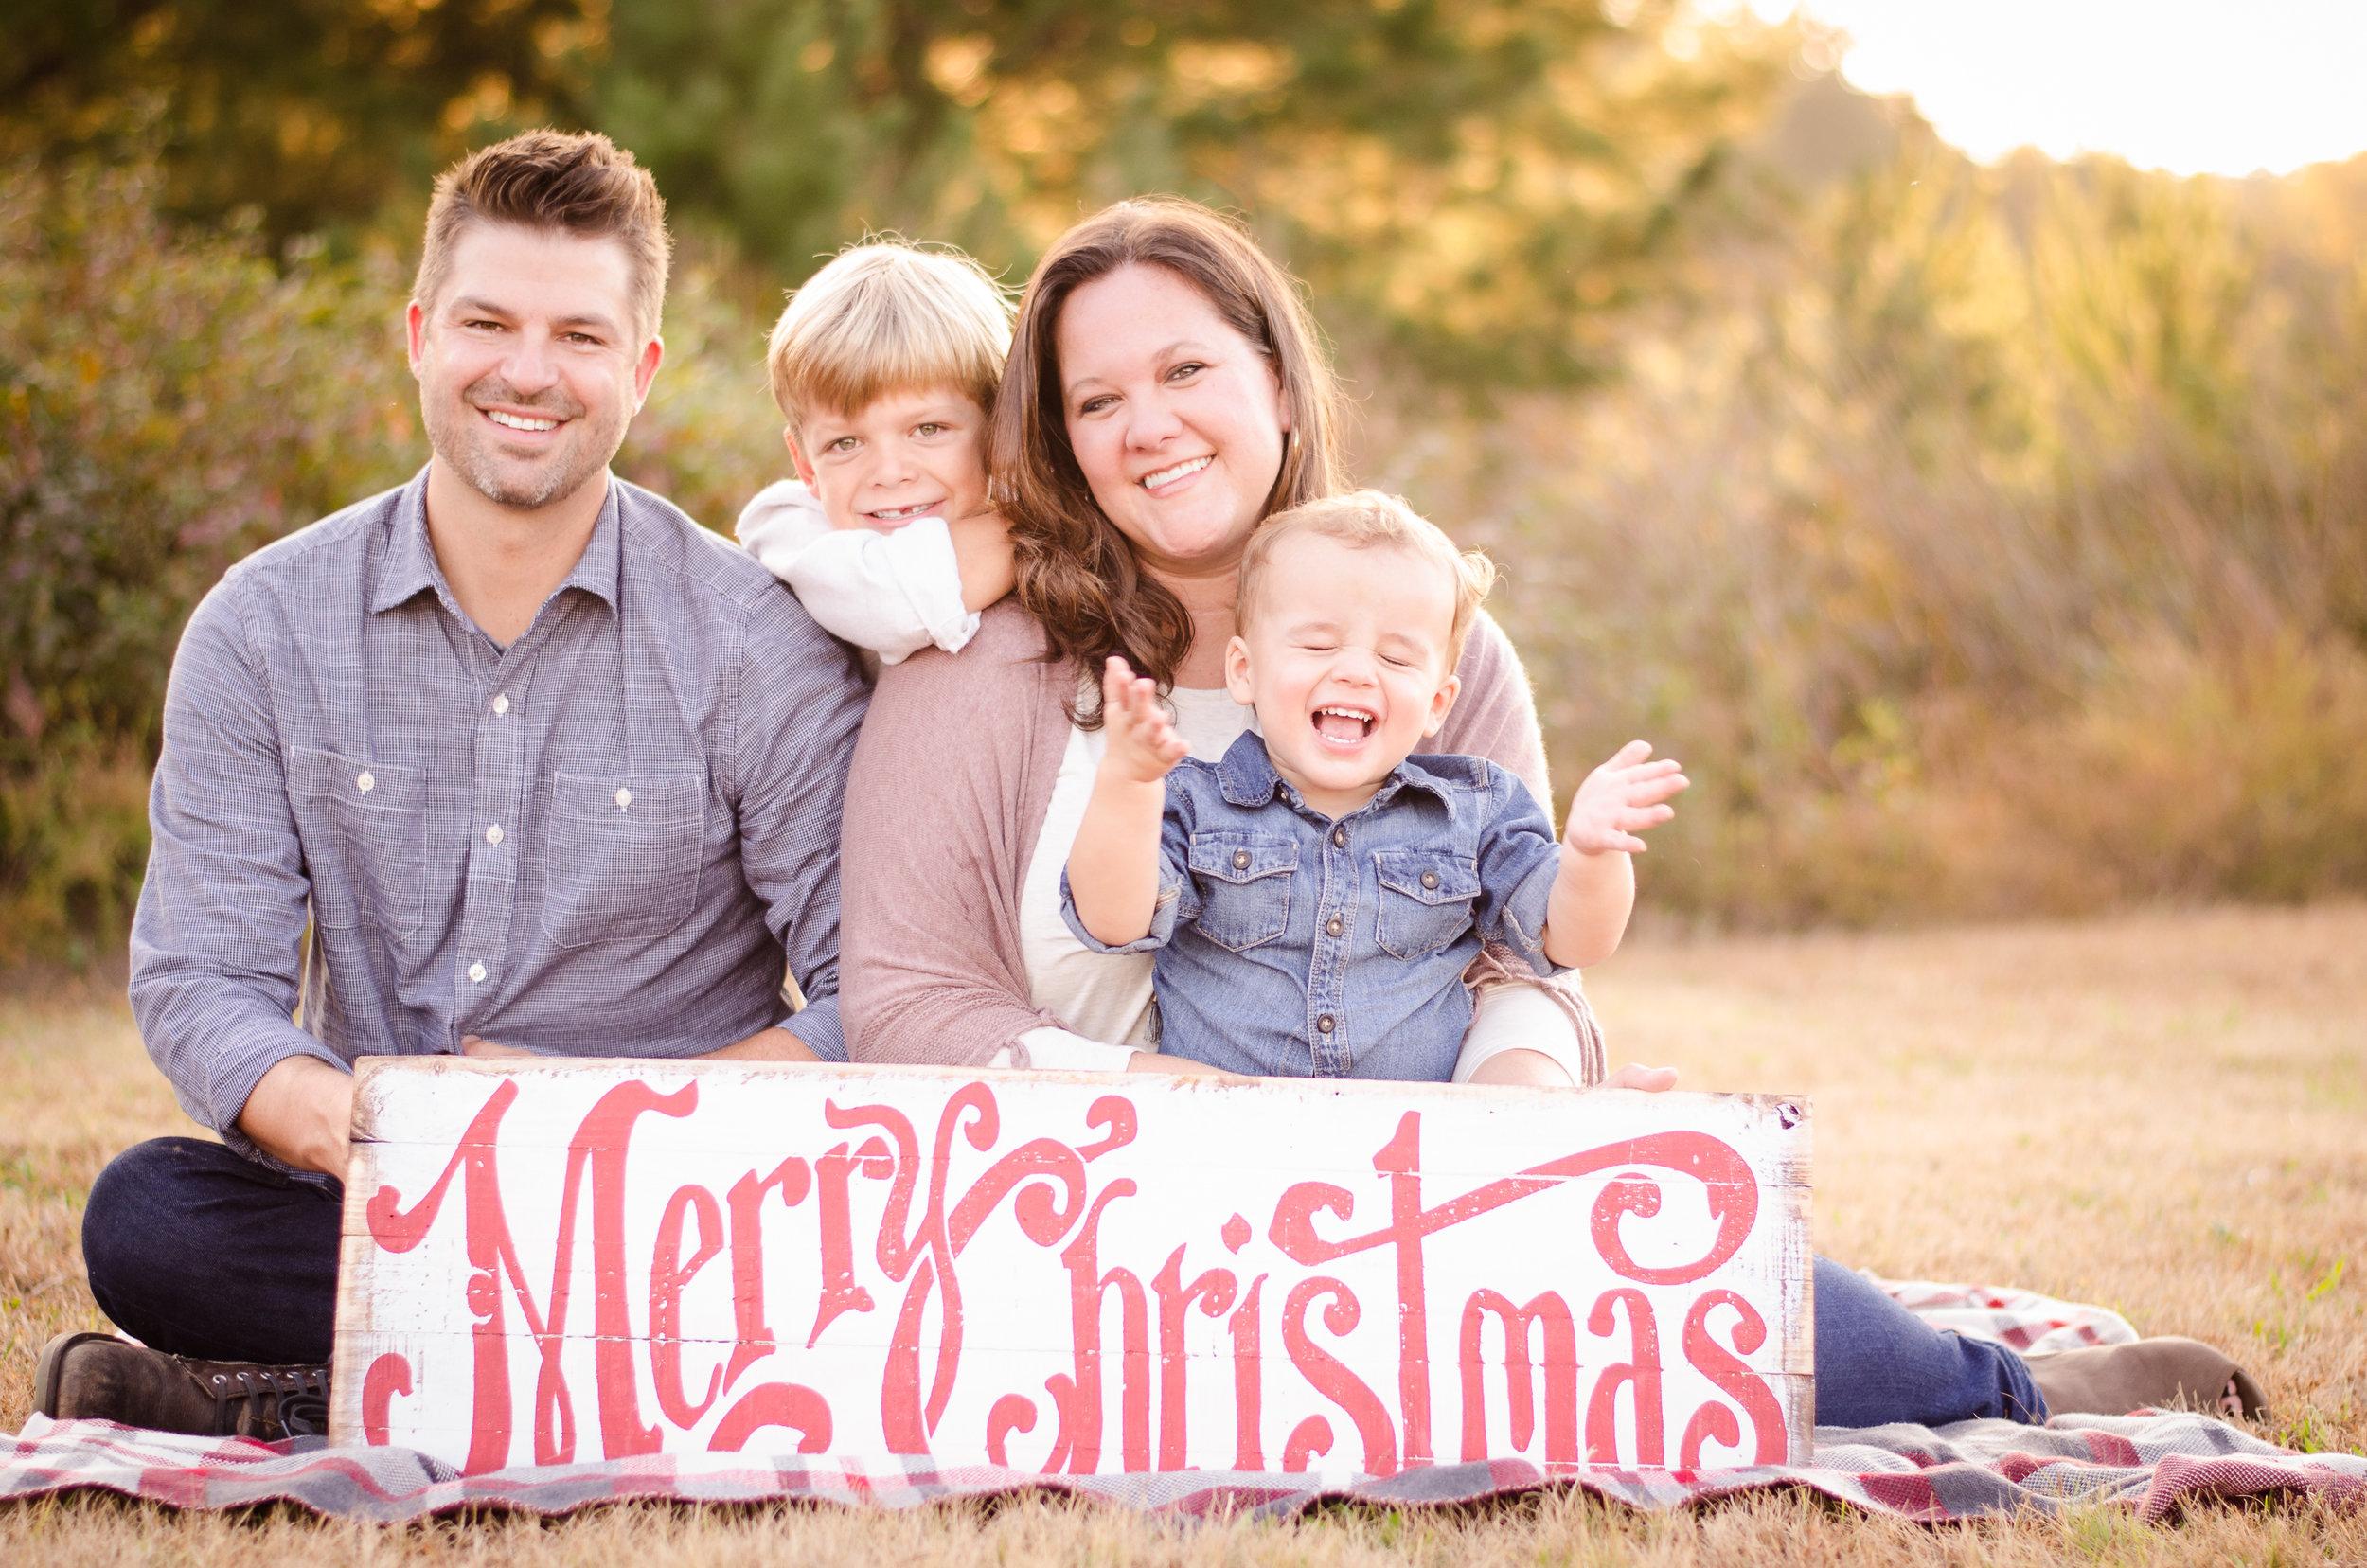 ChristmasExamples-15.jpg